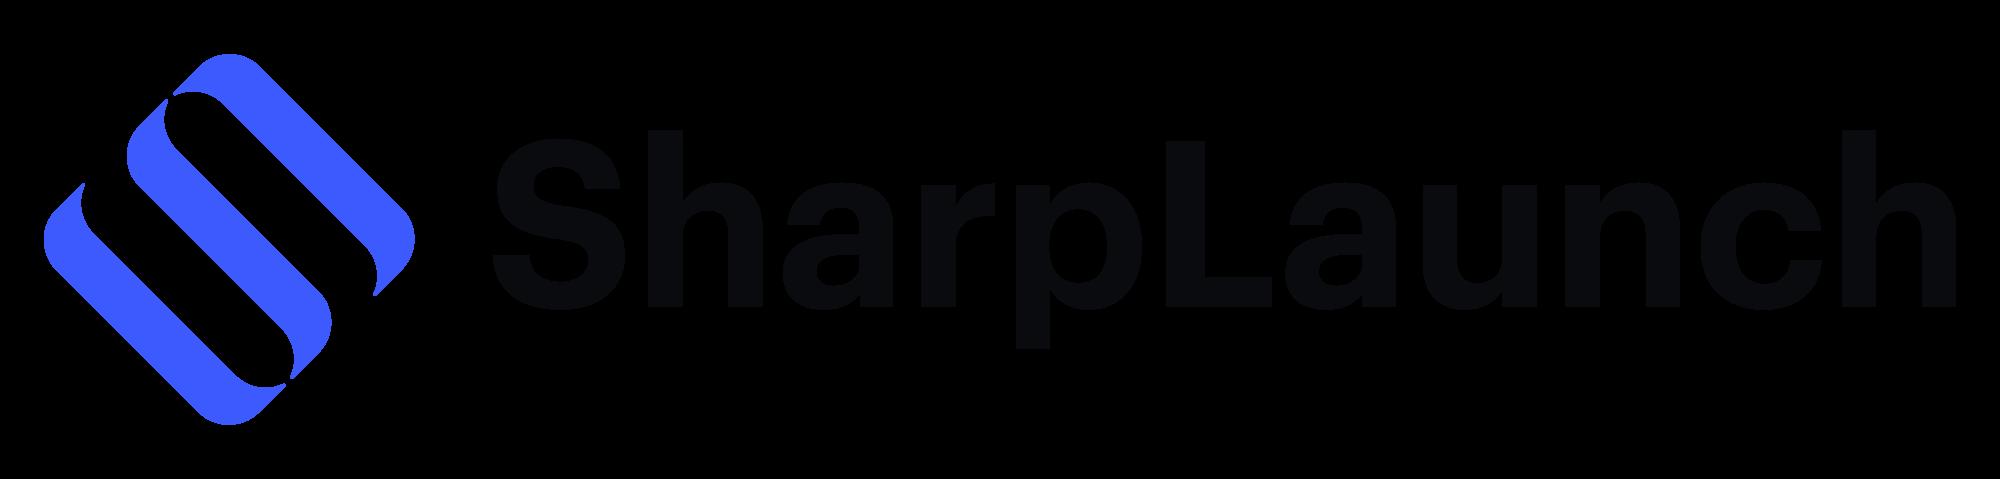 SharpLaunch Logo